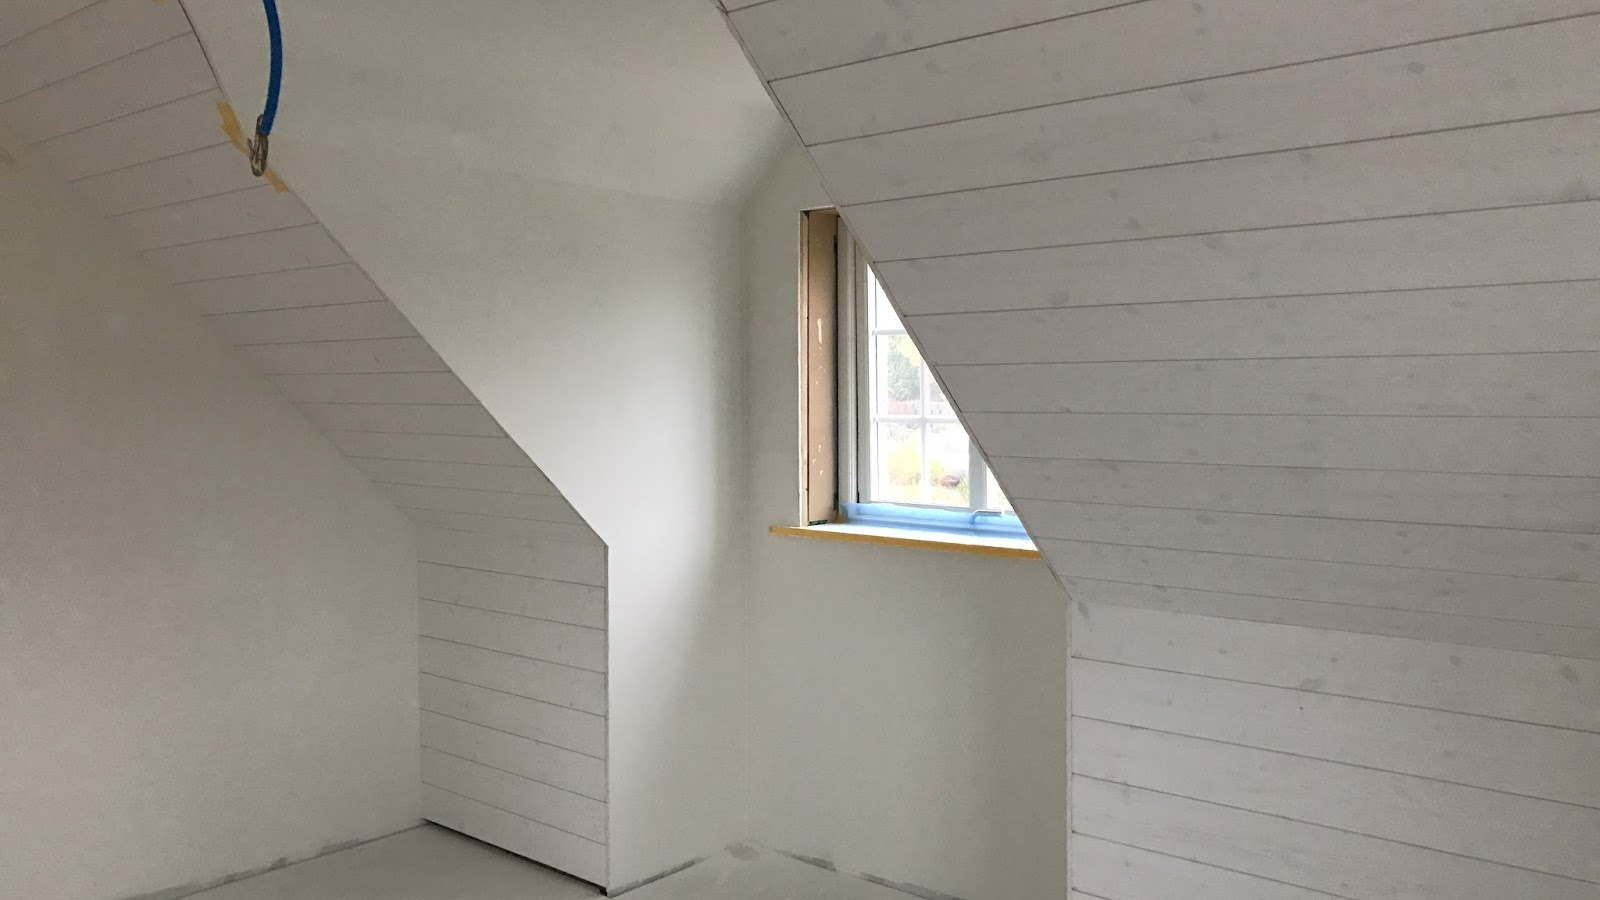 2016 beachhouse living. Black Bedroom Furniture Sets. Home Design Ideas